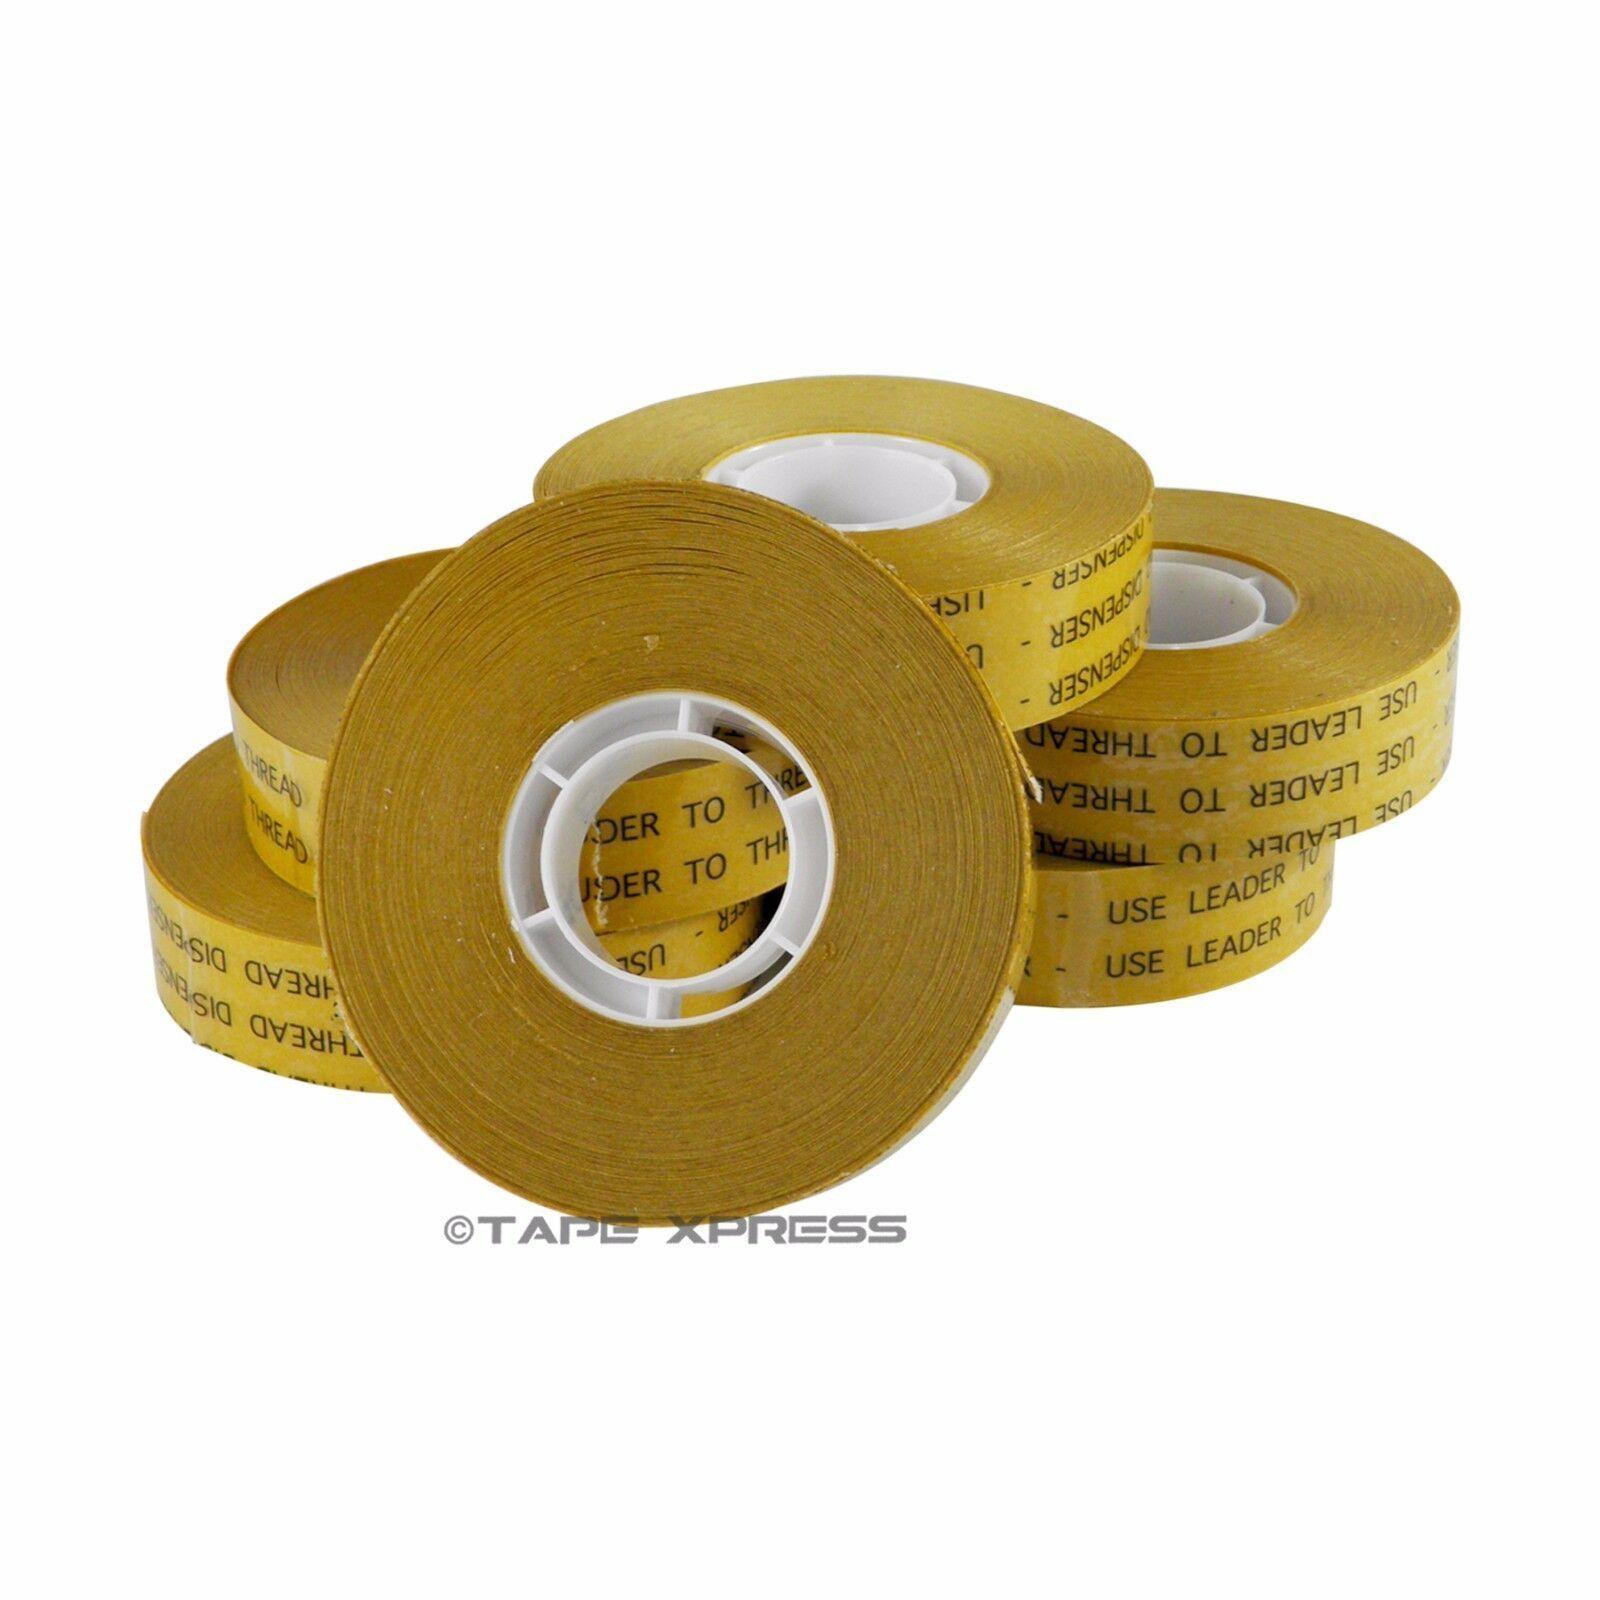 "6 rolls 3/4"" ATG Adhesive Transfer Tape (Fits 3M Gun) Photo Crafts Scrapbooking"